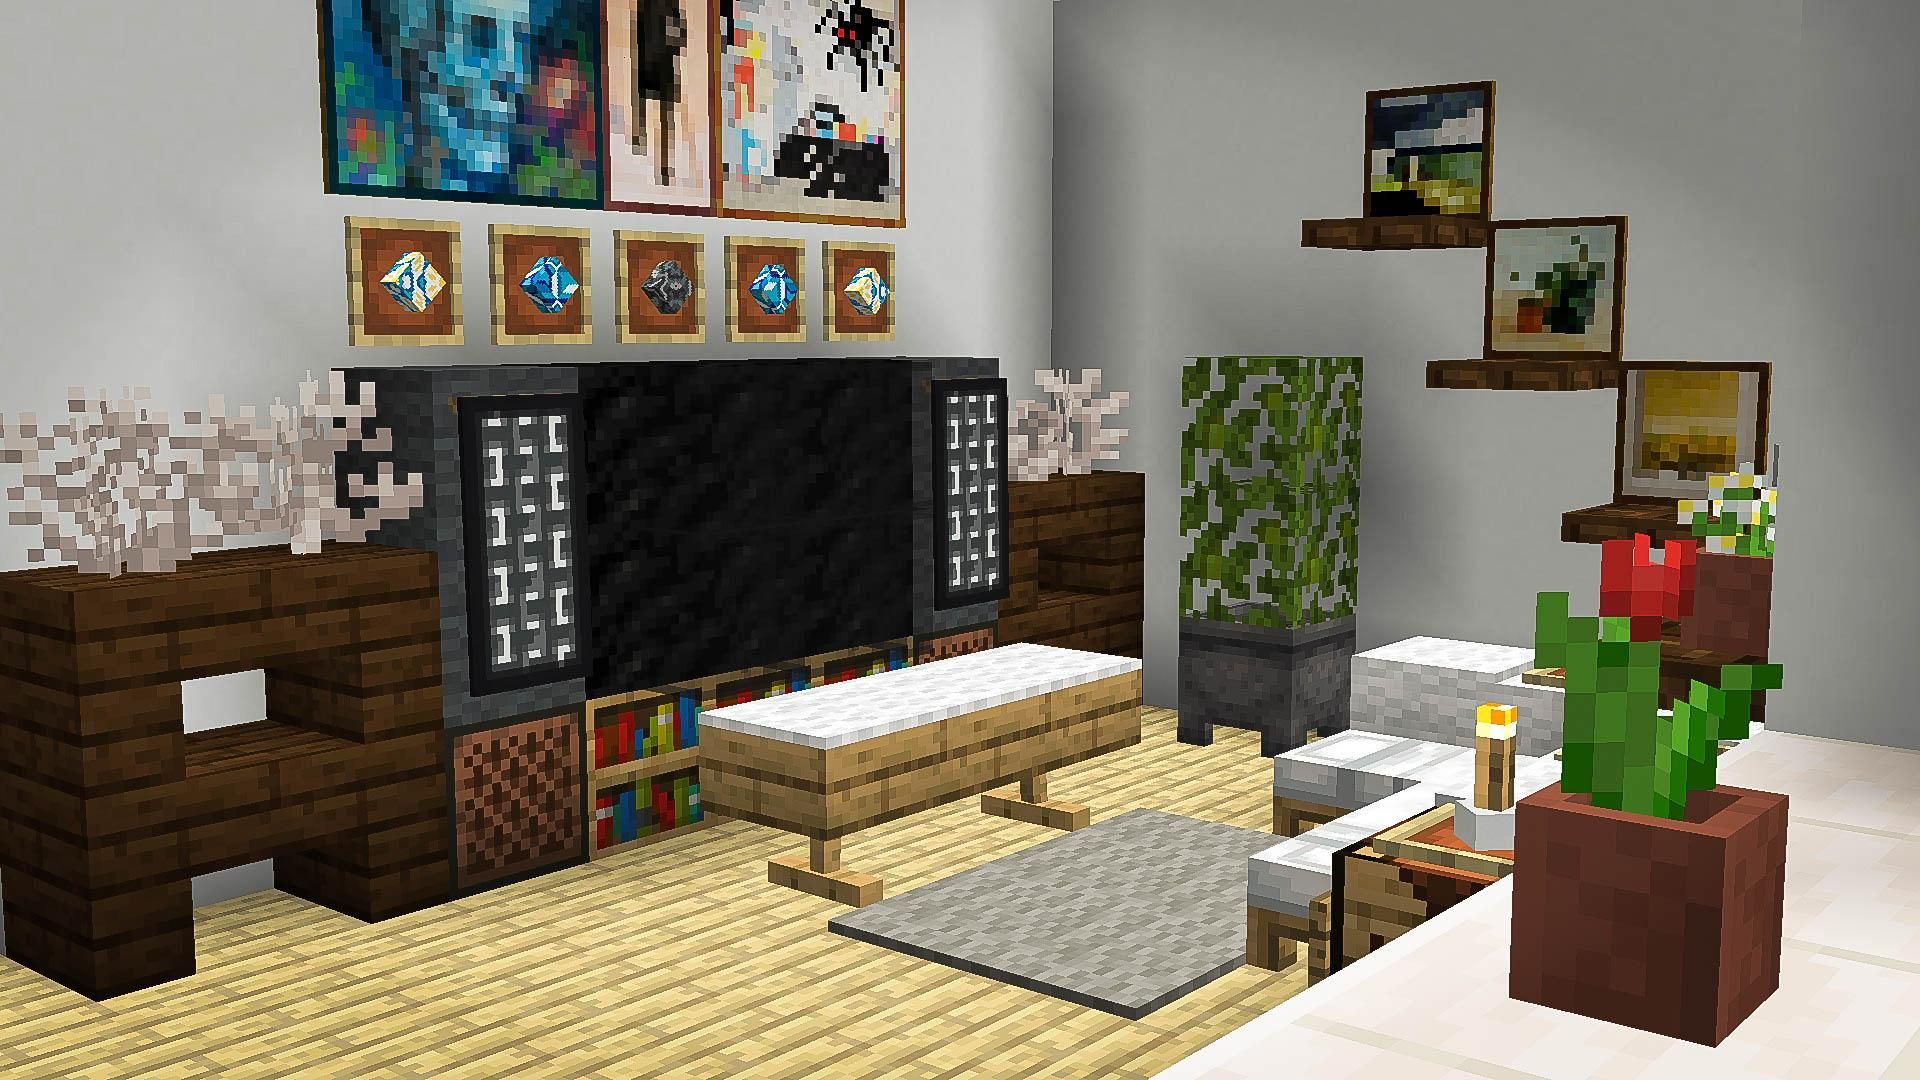 Minecraft Bedroom Ideas In Game Small Novocom Top